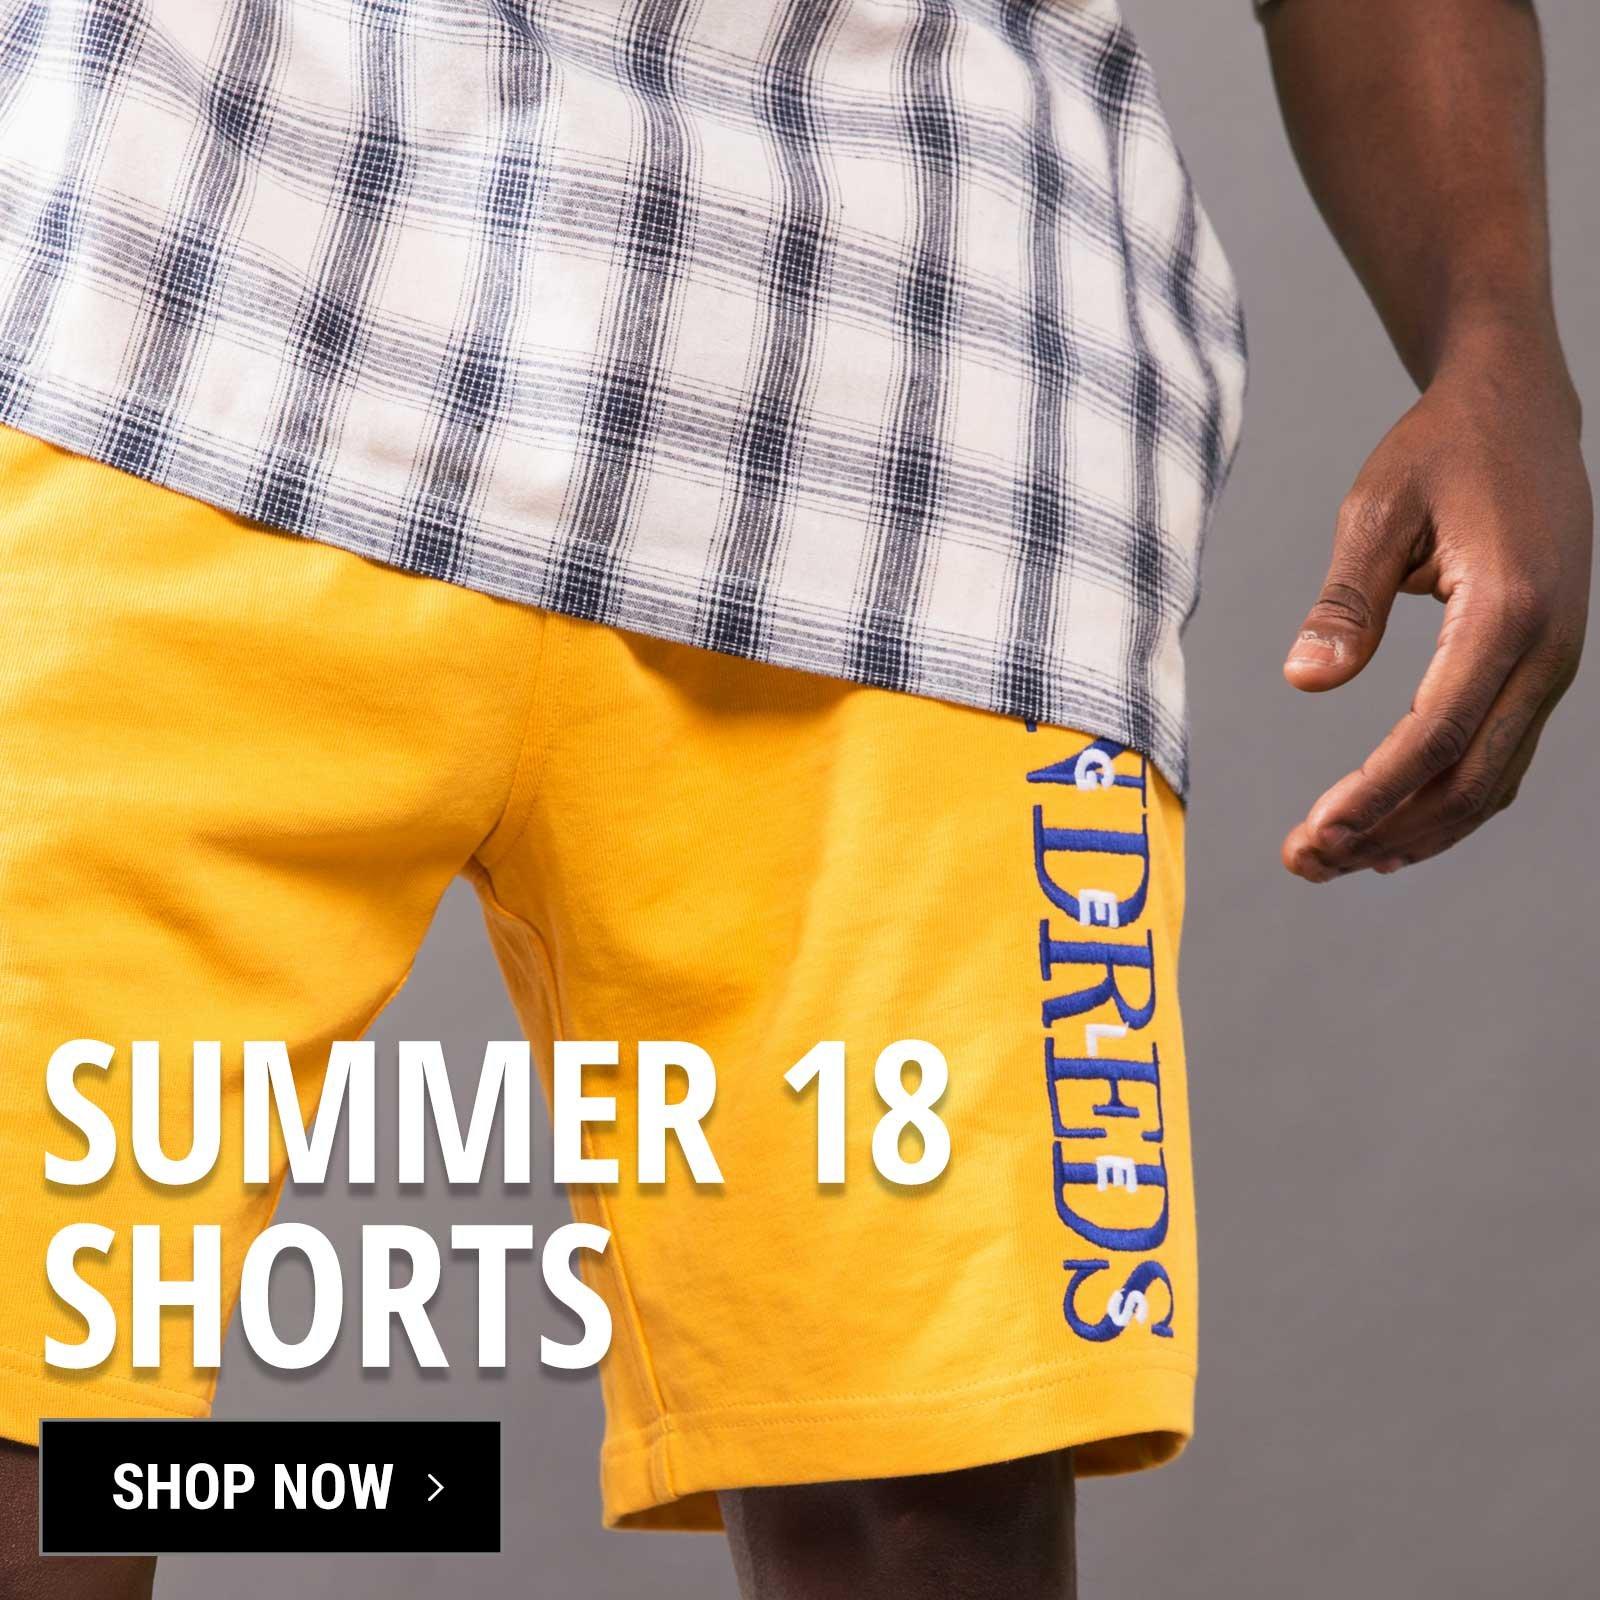 SUMMER '18 SHORTS